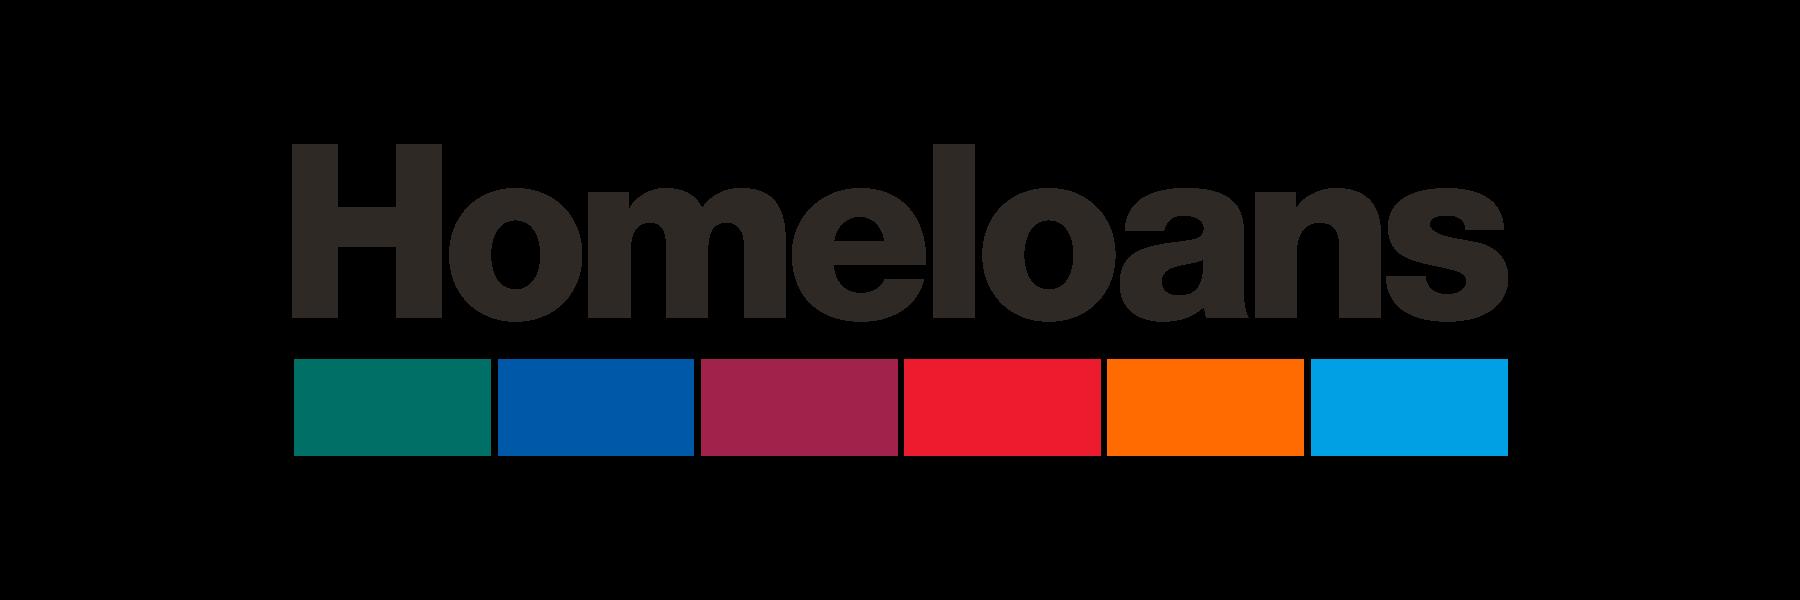 Homeloans_Ltd_logo